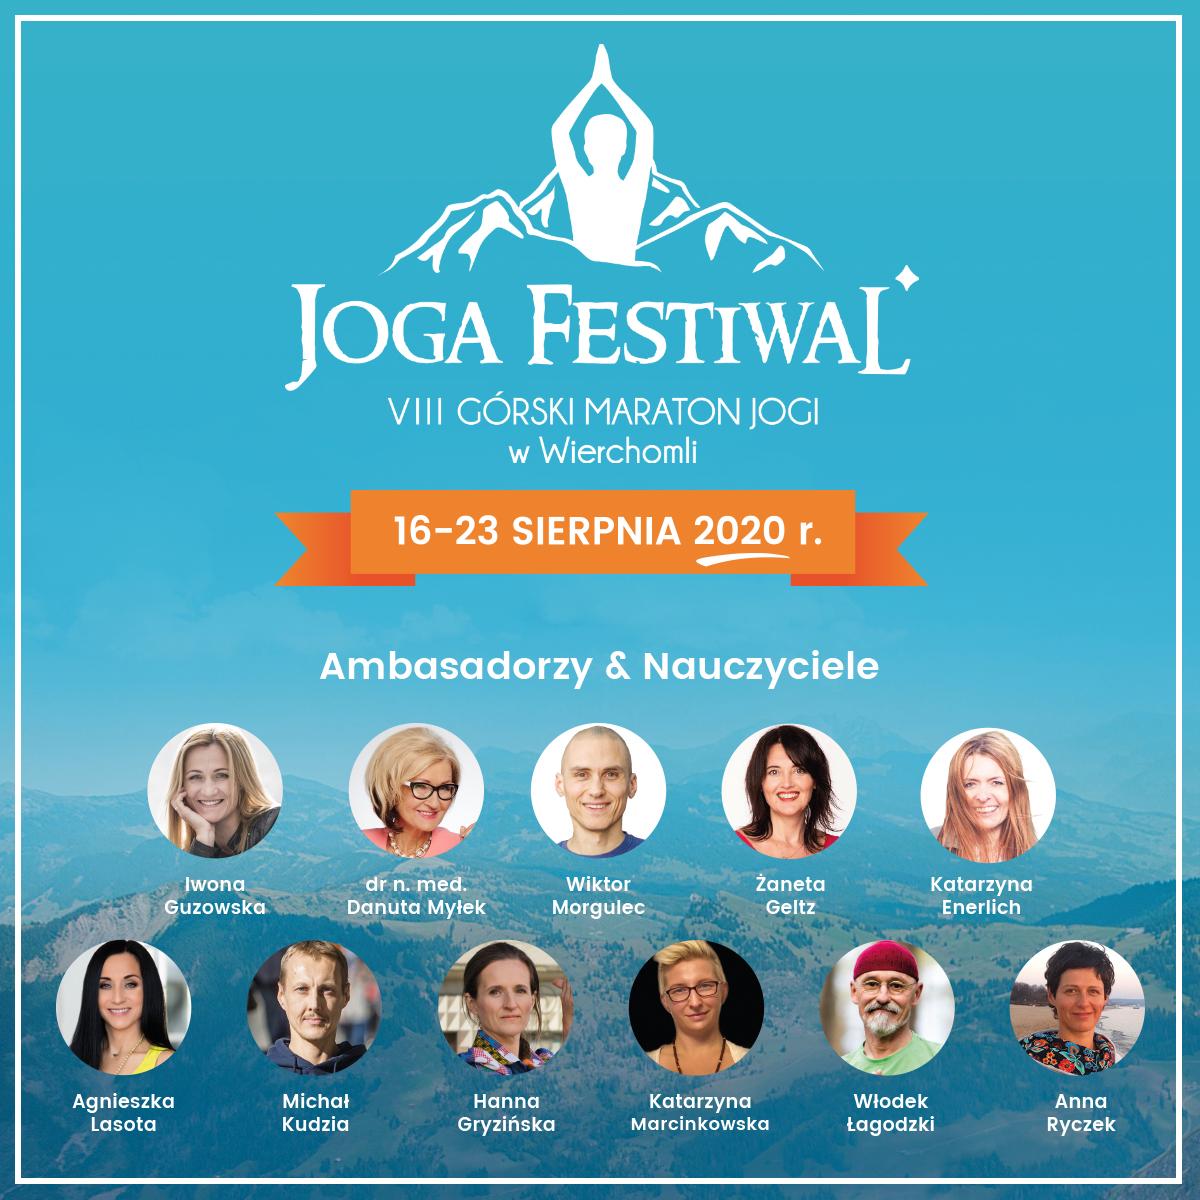 hipoalergiczni-joga-festiwal-osmy-baner-patronat-medialny-fb-post-02